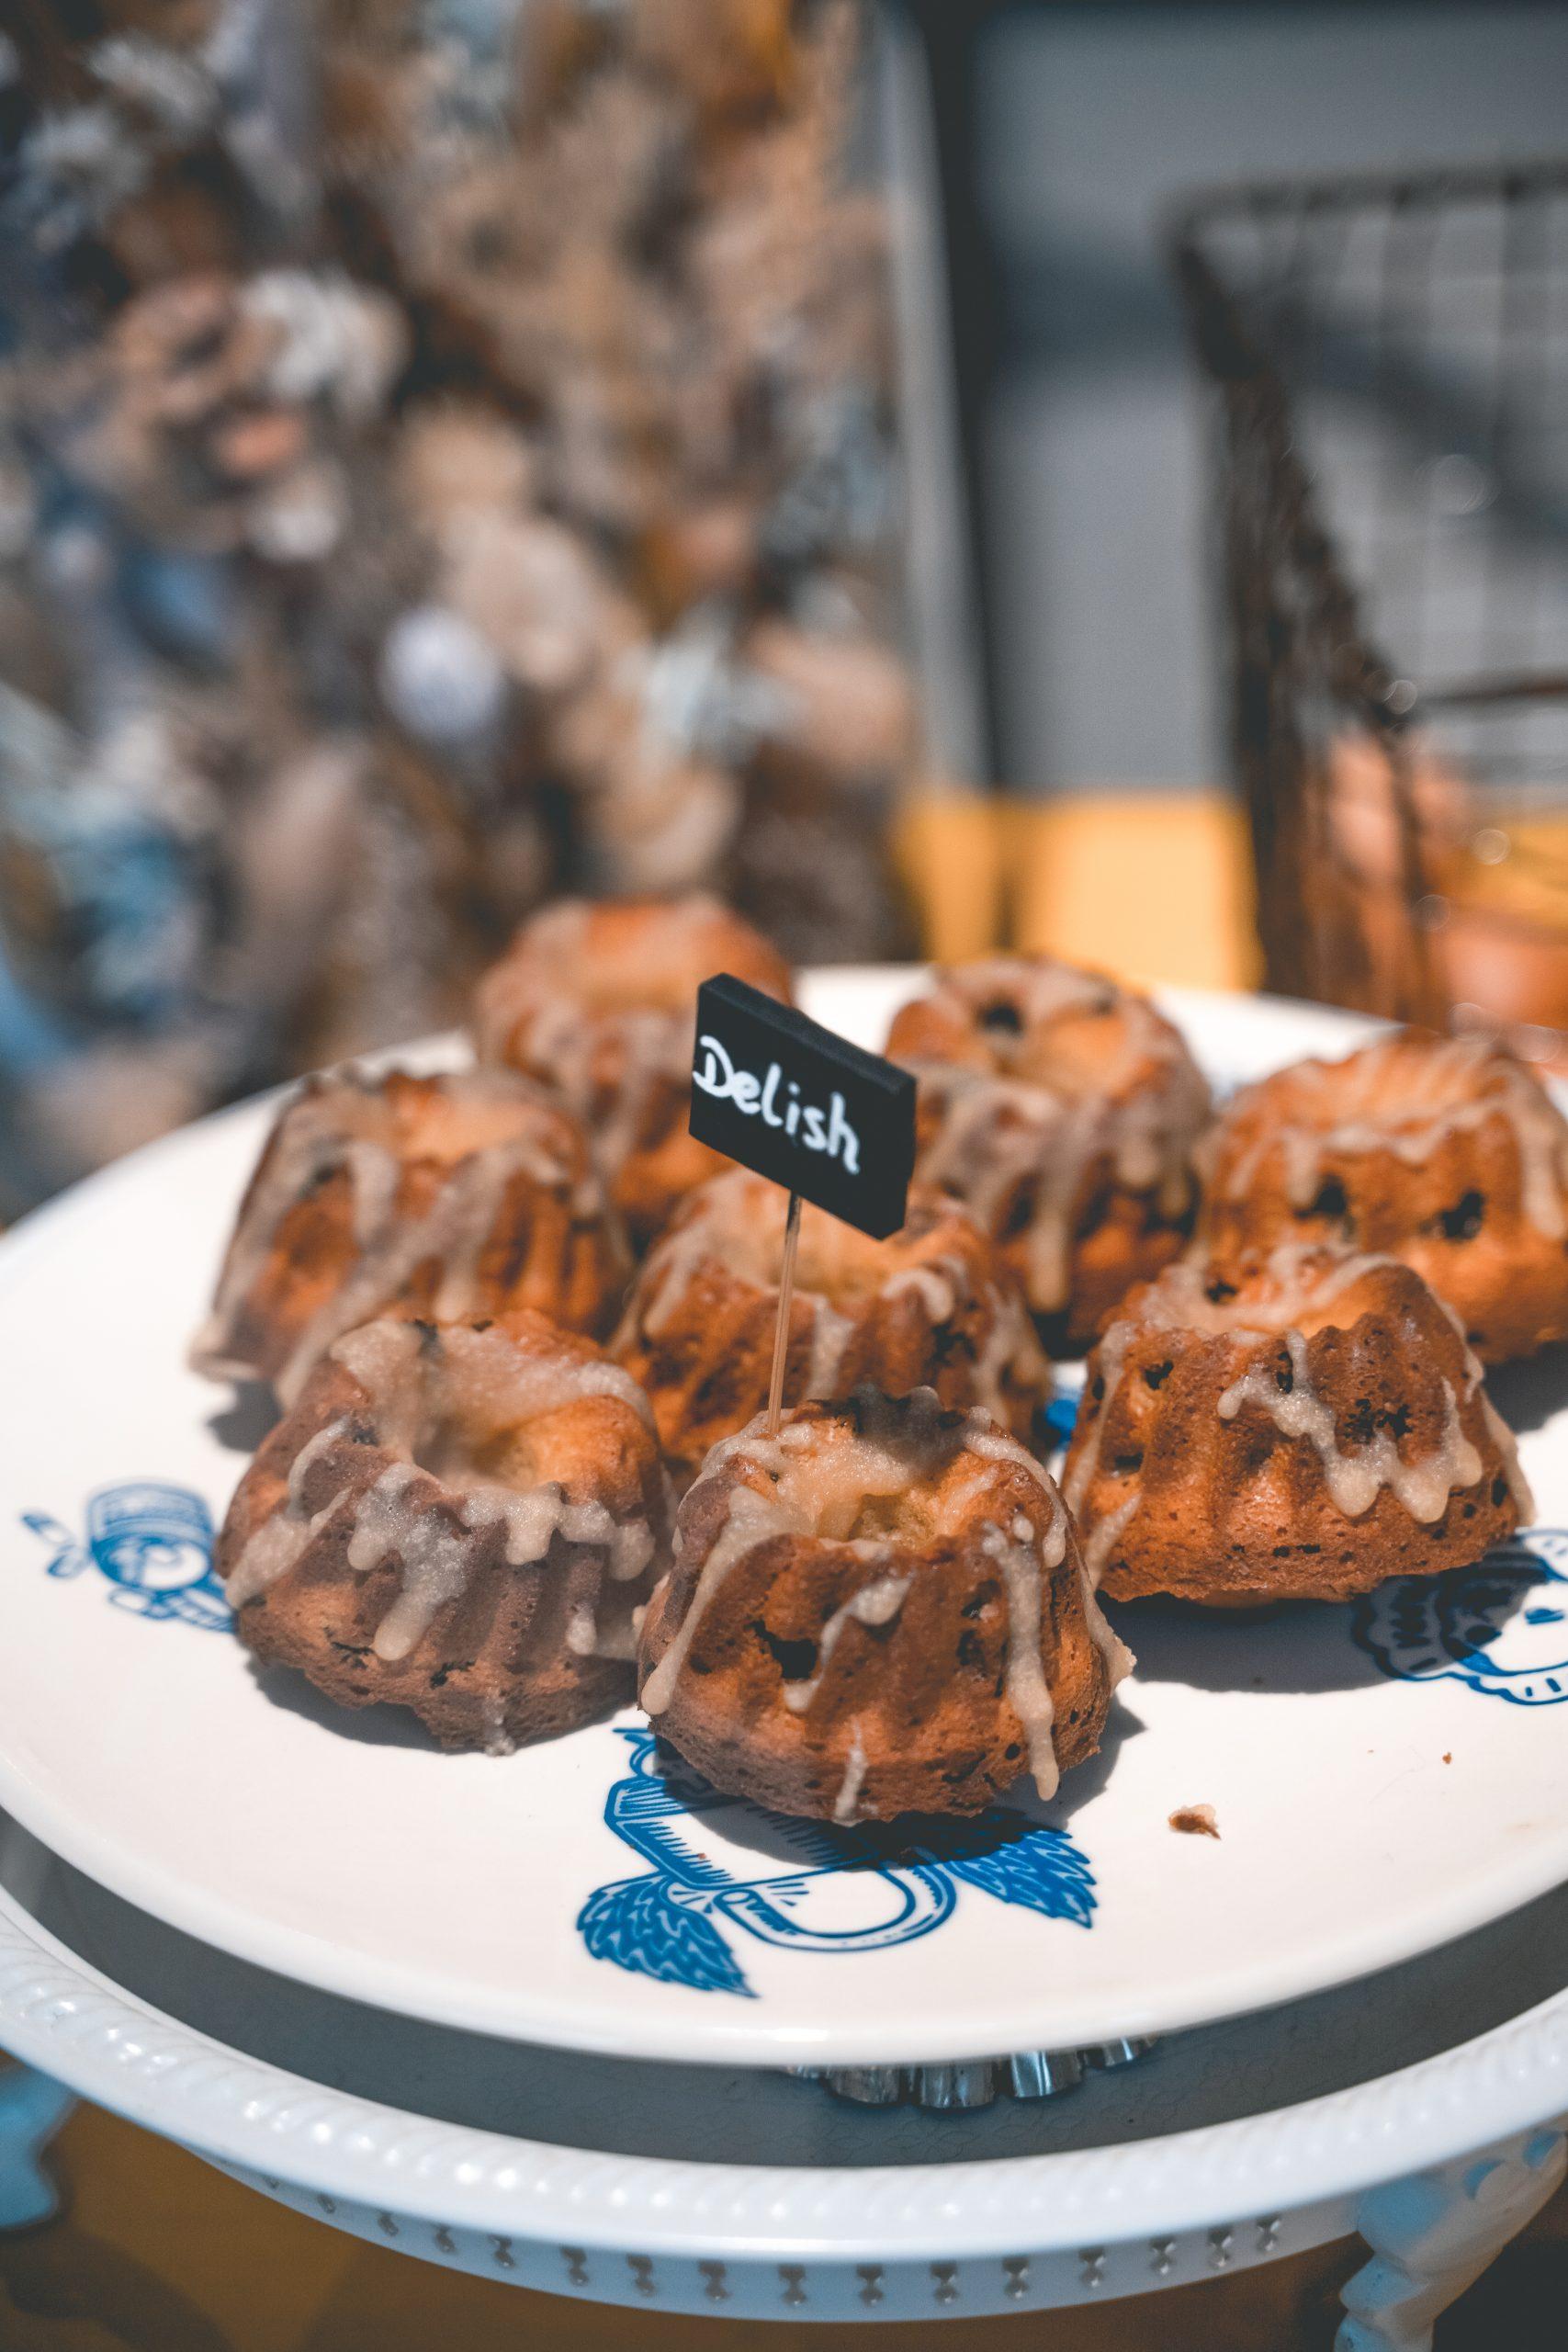 Cake Daddy rumrozijn tulbandjes gebak Den Bosch